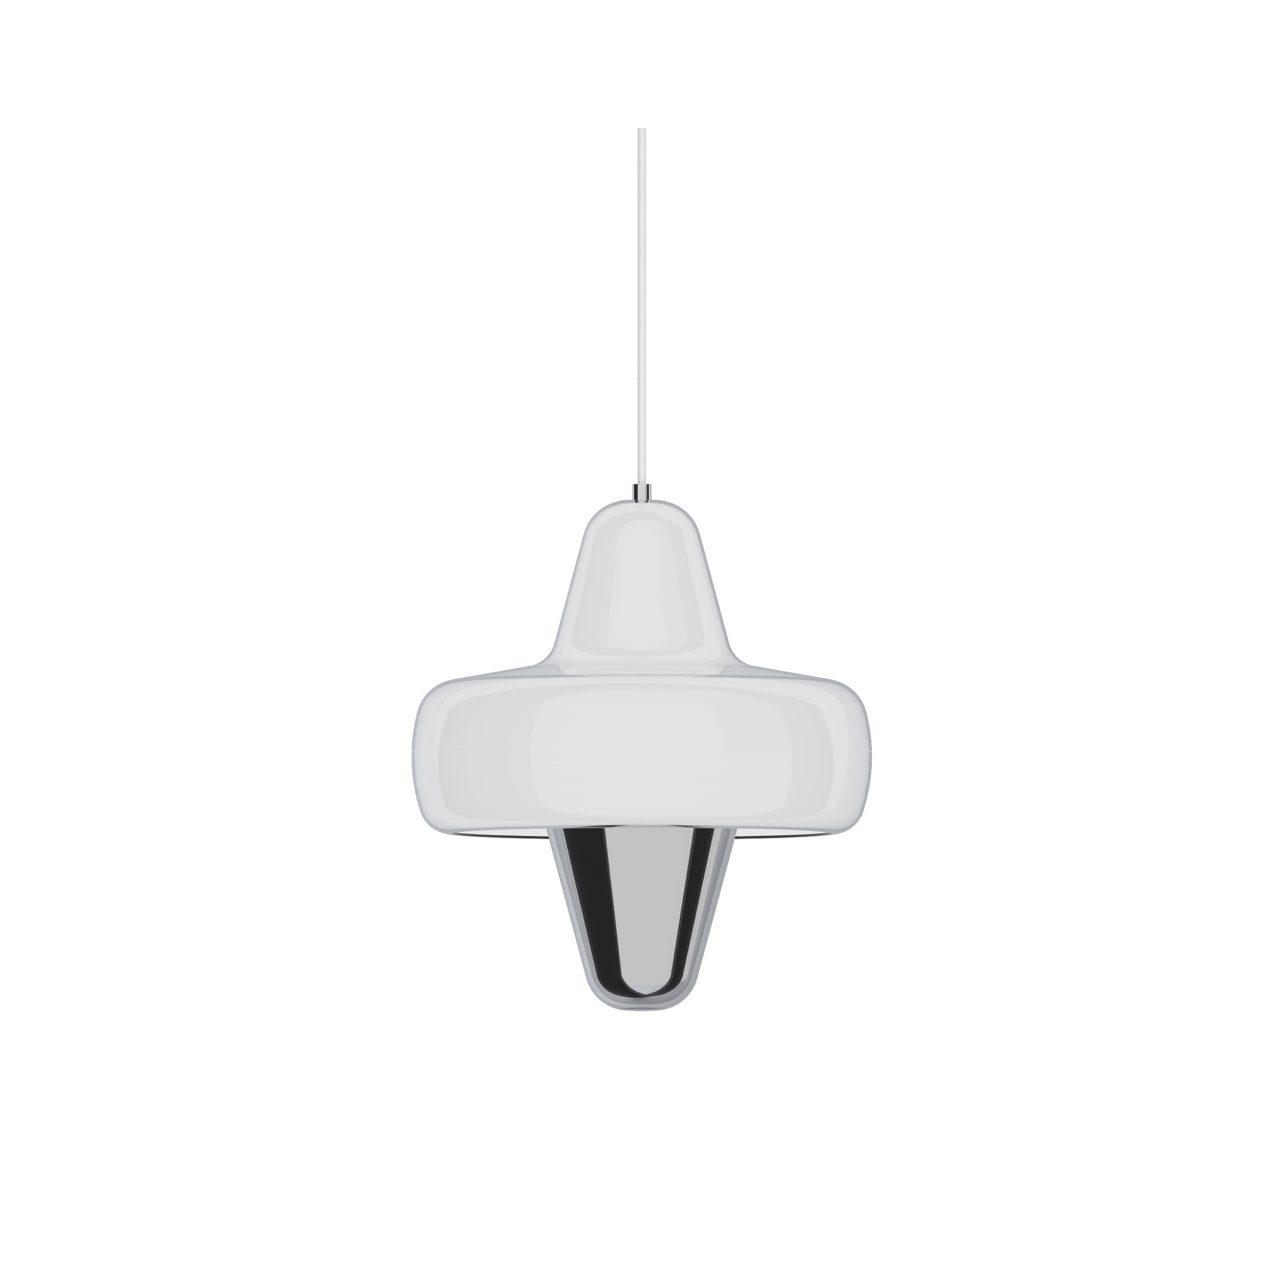 Luminaire - suspension. Fabrication française.